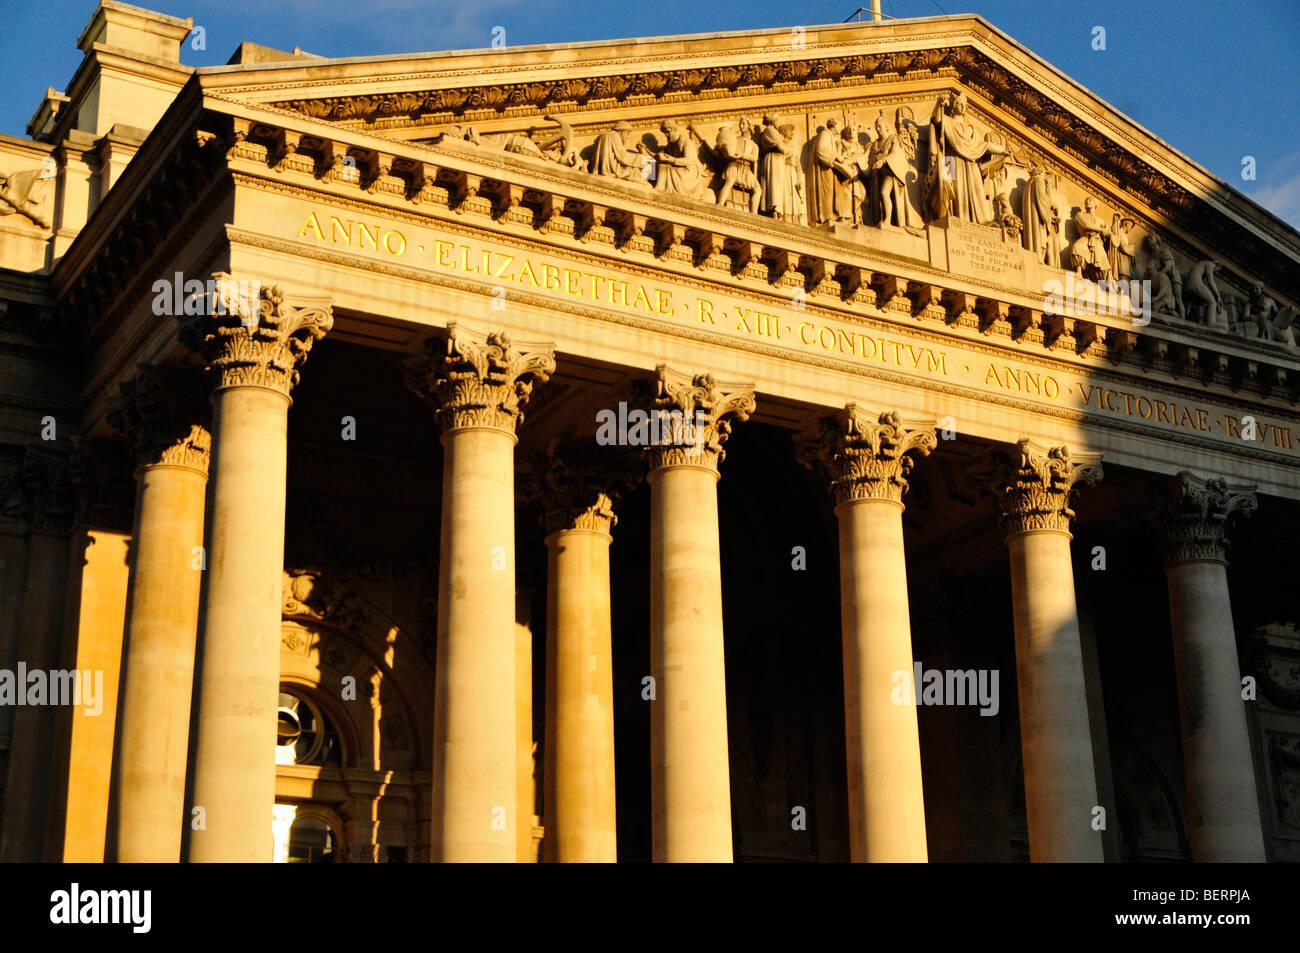 The Royal Exchange, Bank, City of London, EC3 - Stock Image